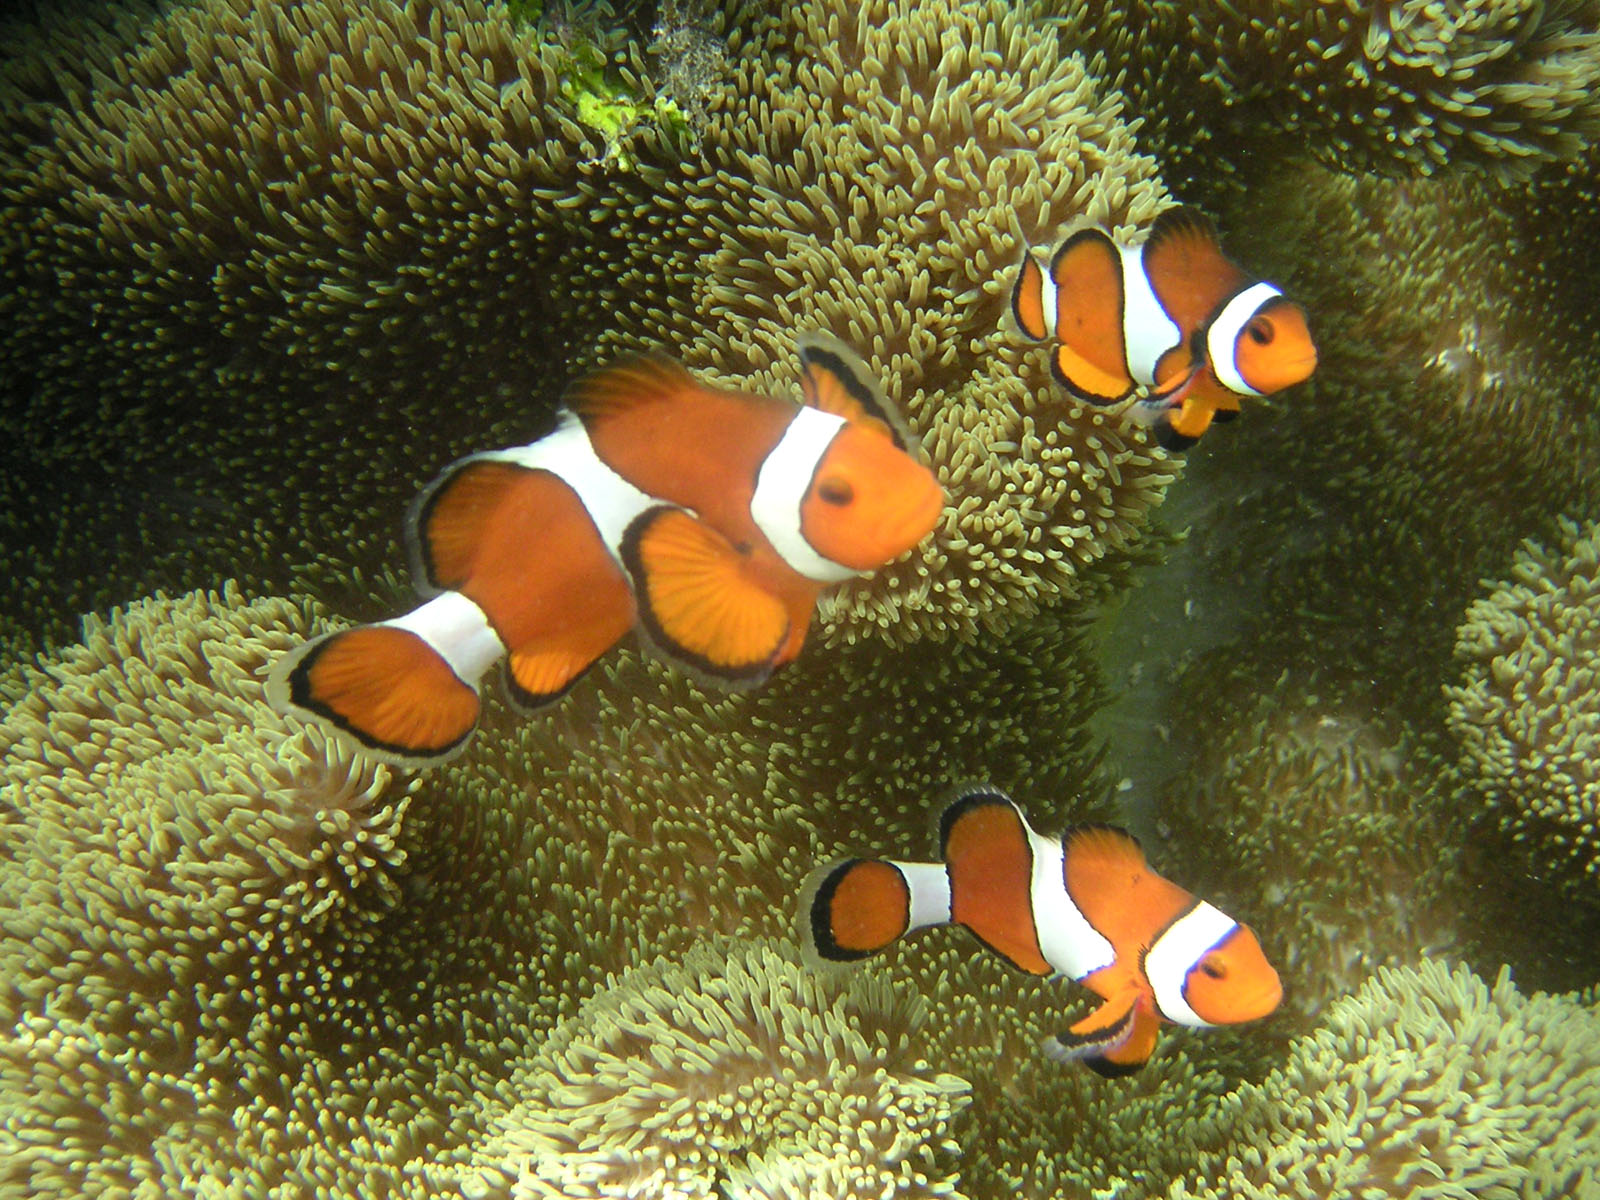 Clown fish - photo#21